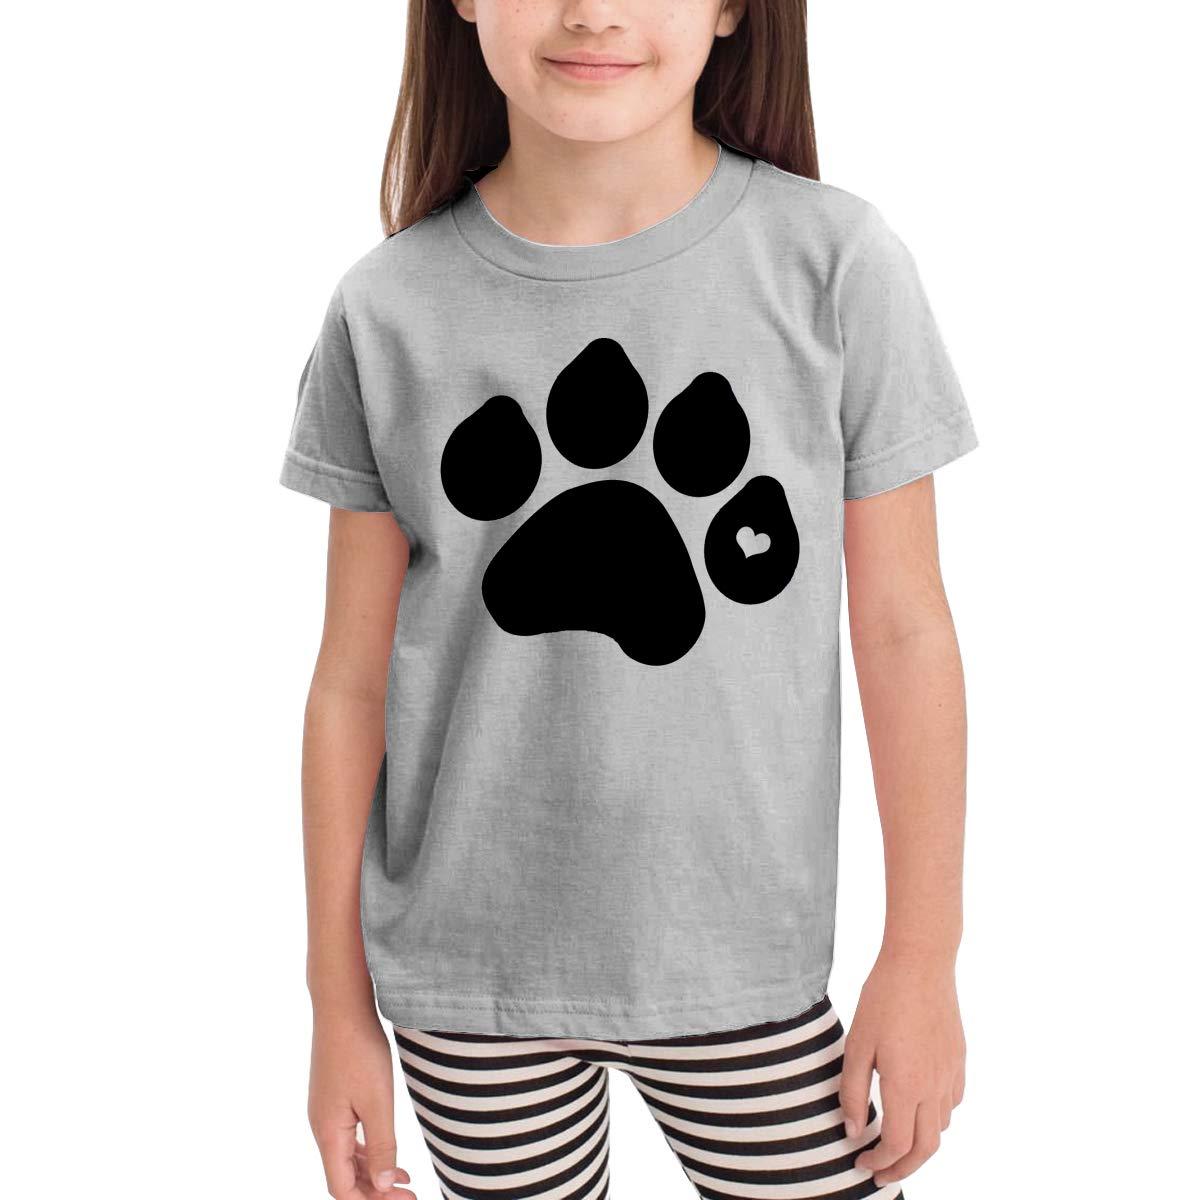 Dog Paw Funny Logo Unisex Youths Short Sleeve T-Shirt Kids T-Shirt Tops Black